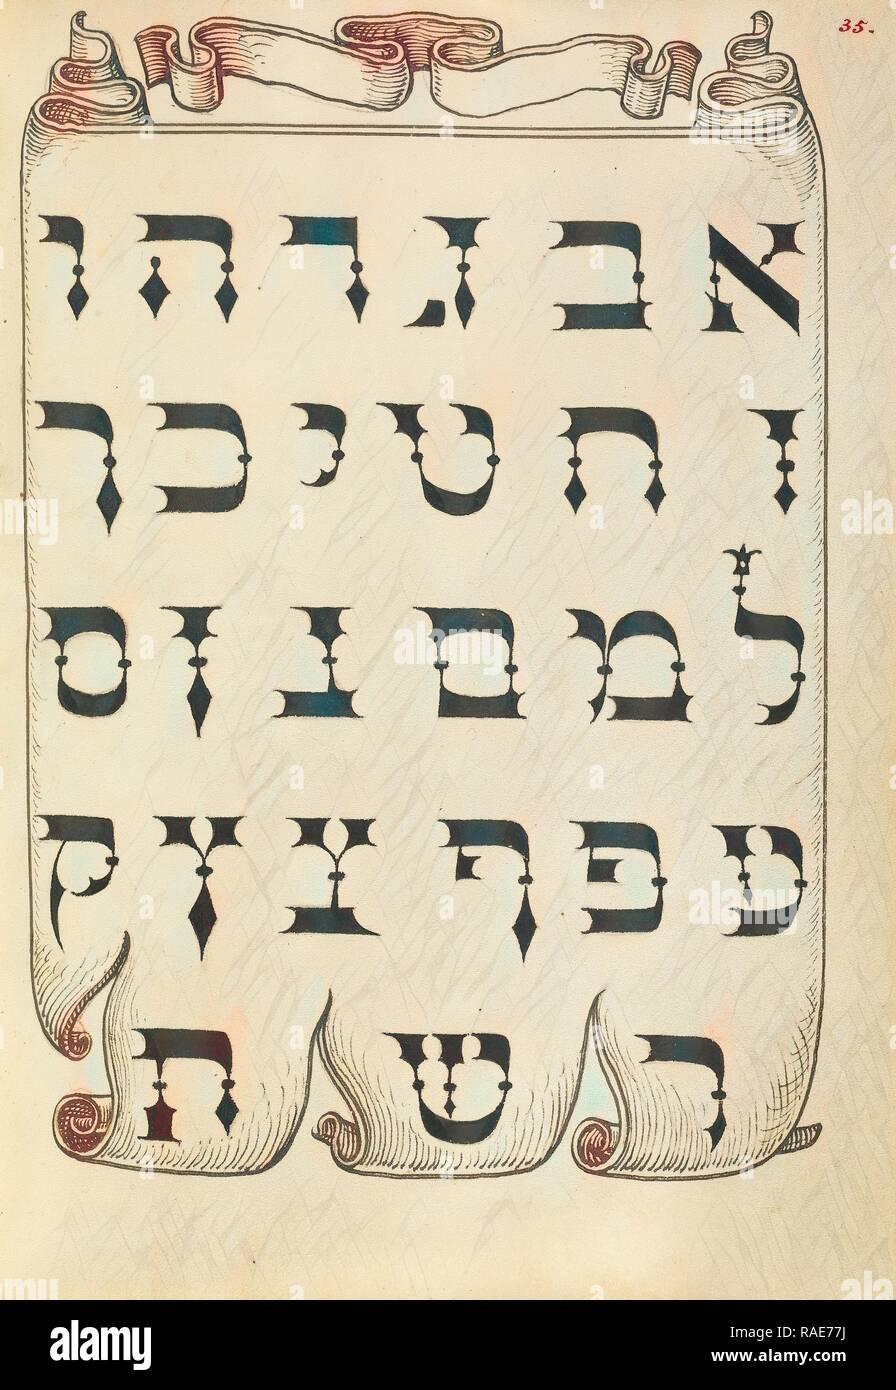 The Hebrew Alphabet, Joris Hoefnagel (Flemish , Hungarian, 1542 - 1600), and Georg Bocskay (Hungarian, died 1575 reimagined - Stock Image